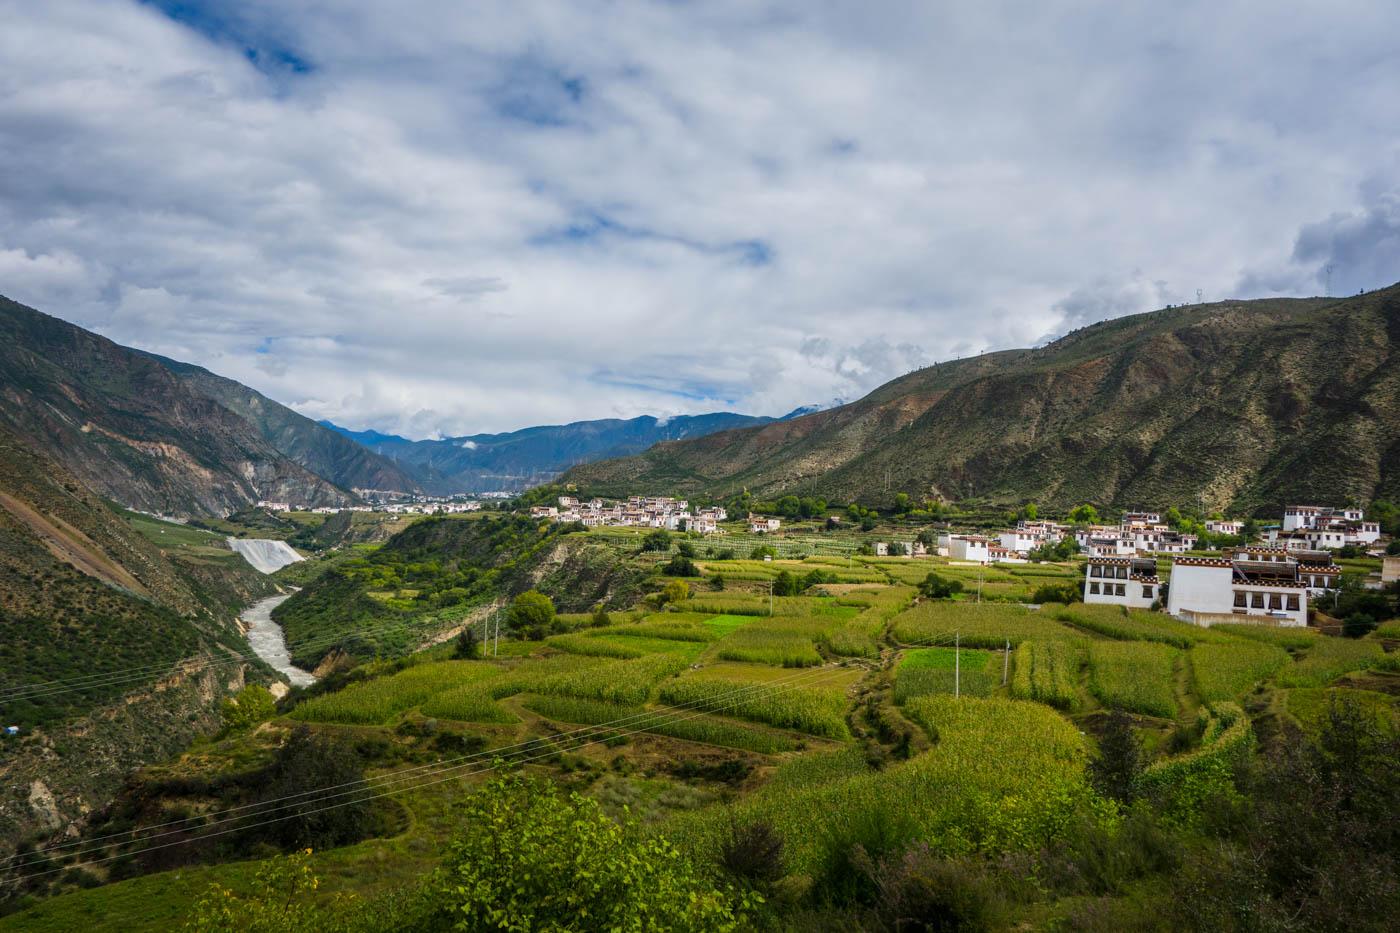 Xiangcheng to Yunnan province - TwistingSpokes